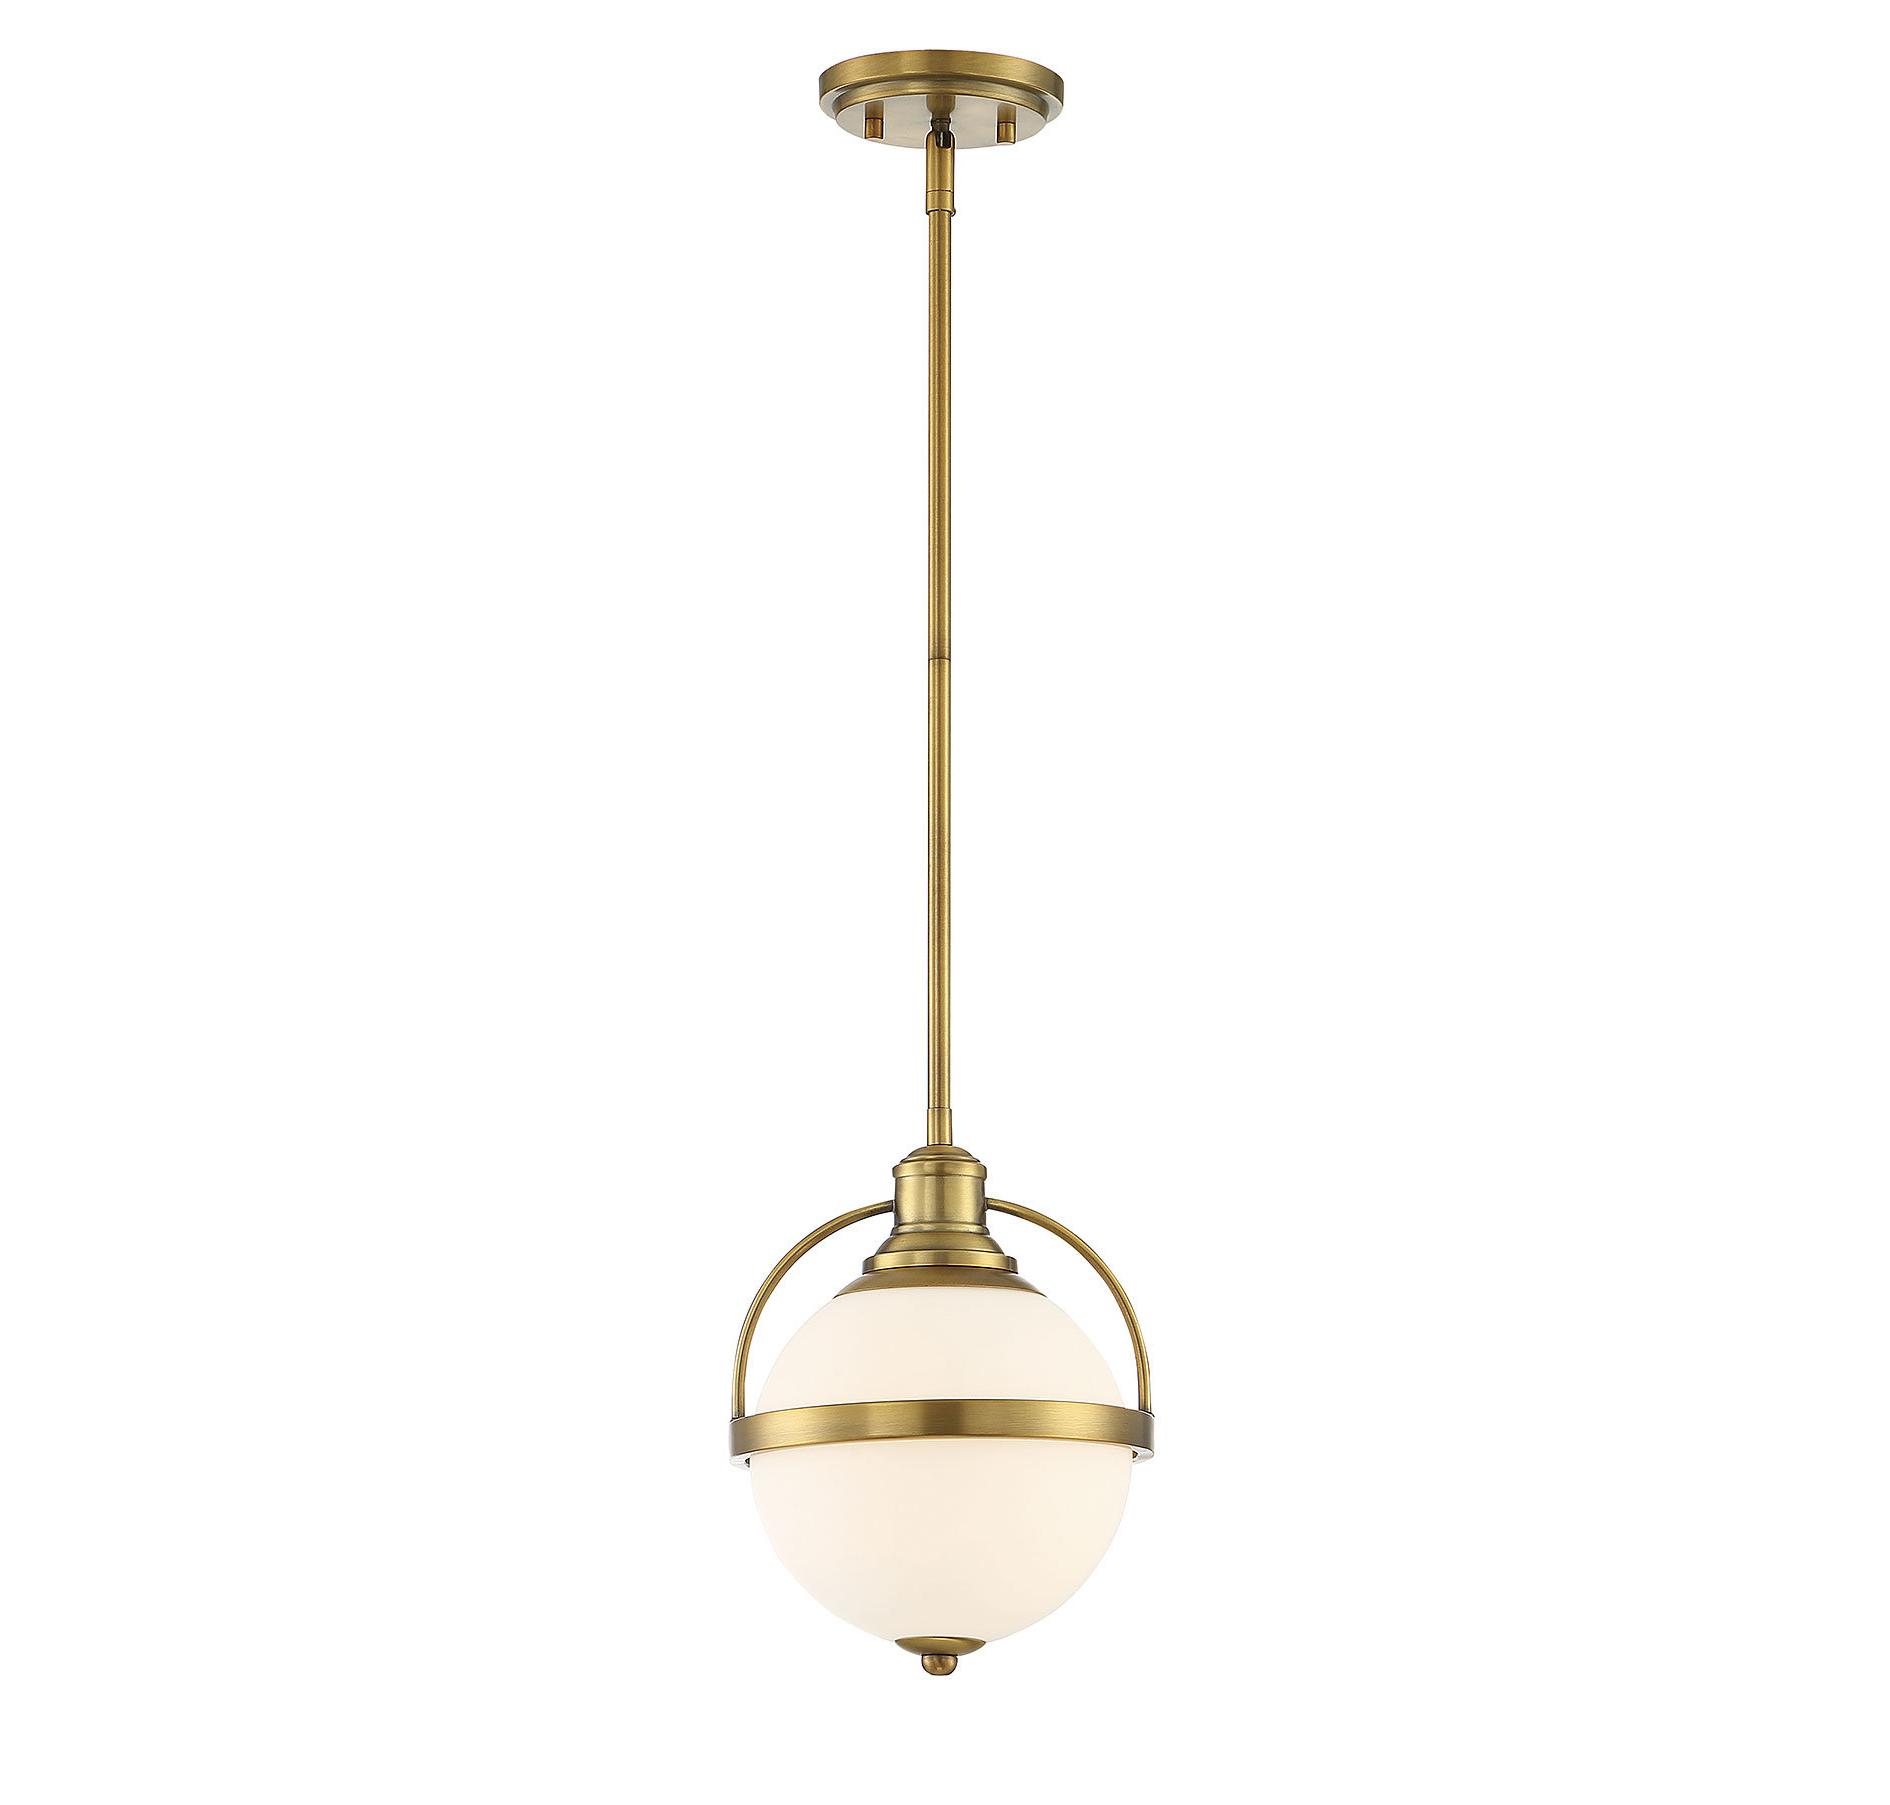 Favorite Bautista 1 Light Single Globe Pendants Throughout Courtland 1 Light Single Globe Pendant (View 14 of 20)